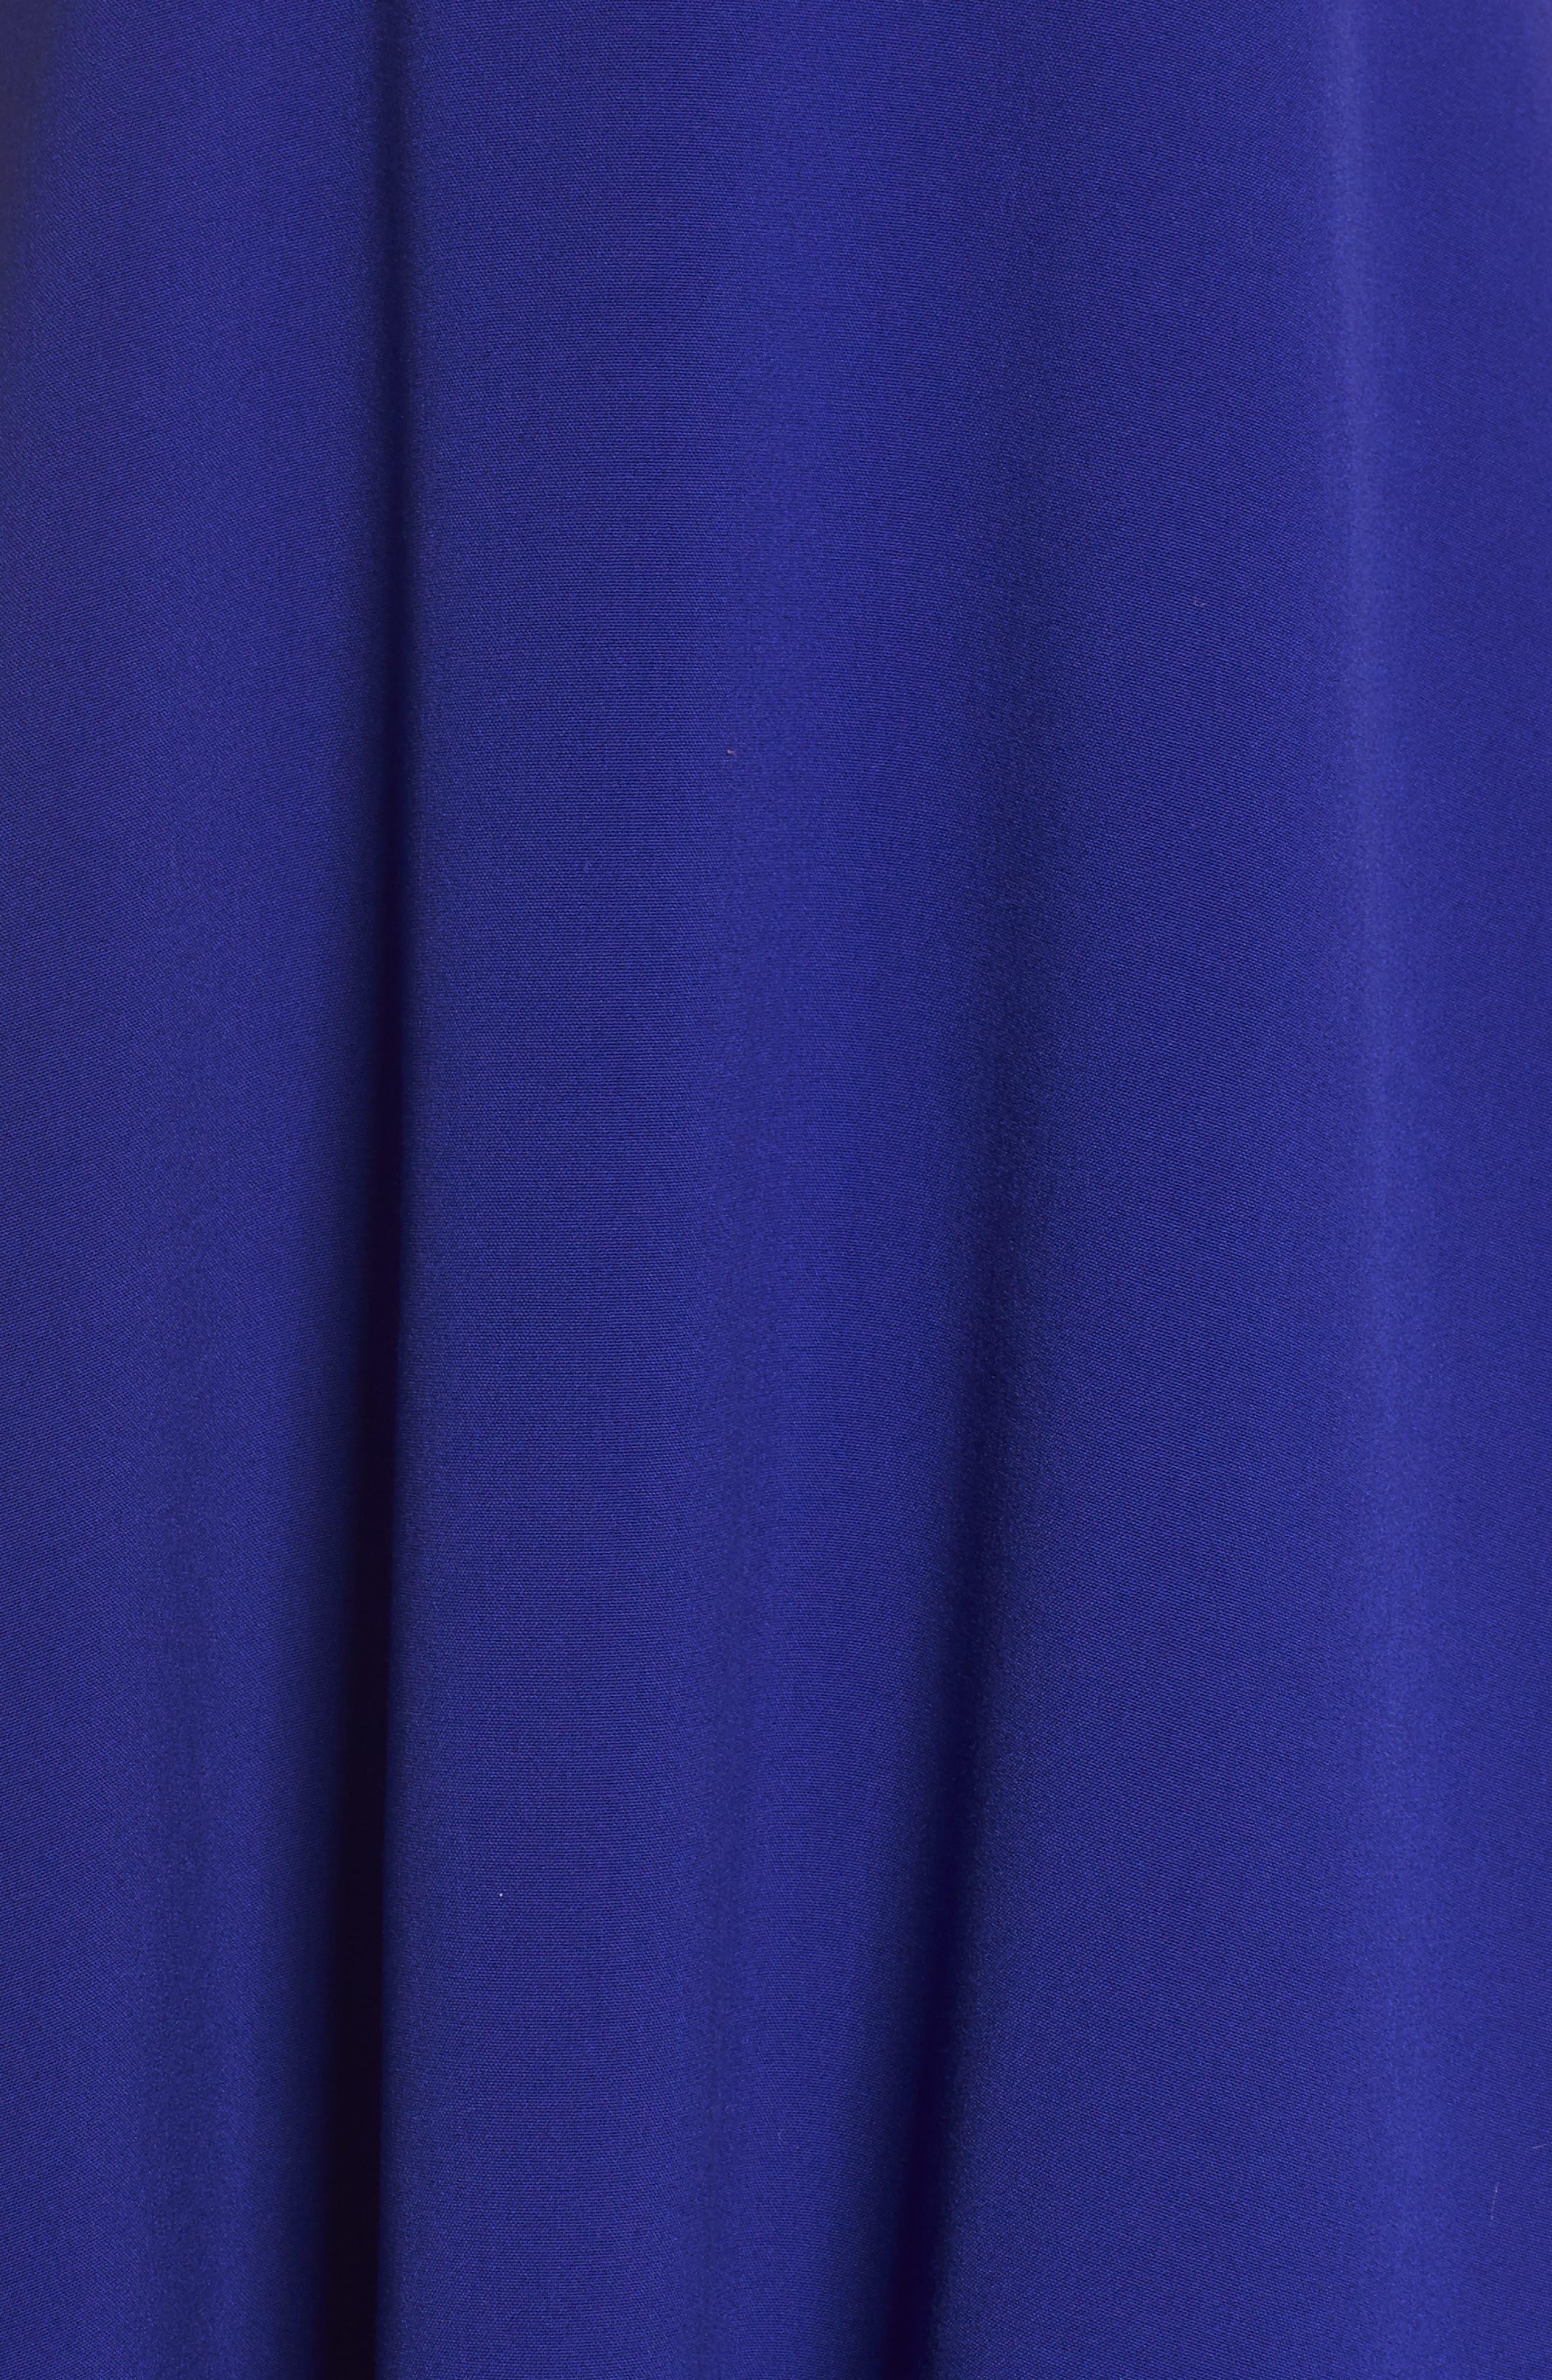 Whisper Ruth Fit & Flare Dress,                             Alternate thumbnail 6, color,                             405